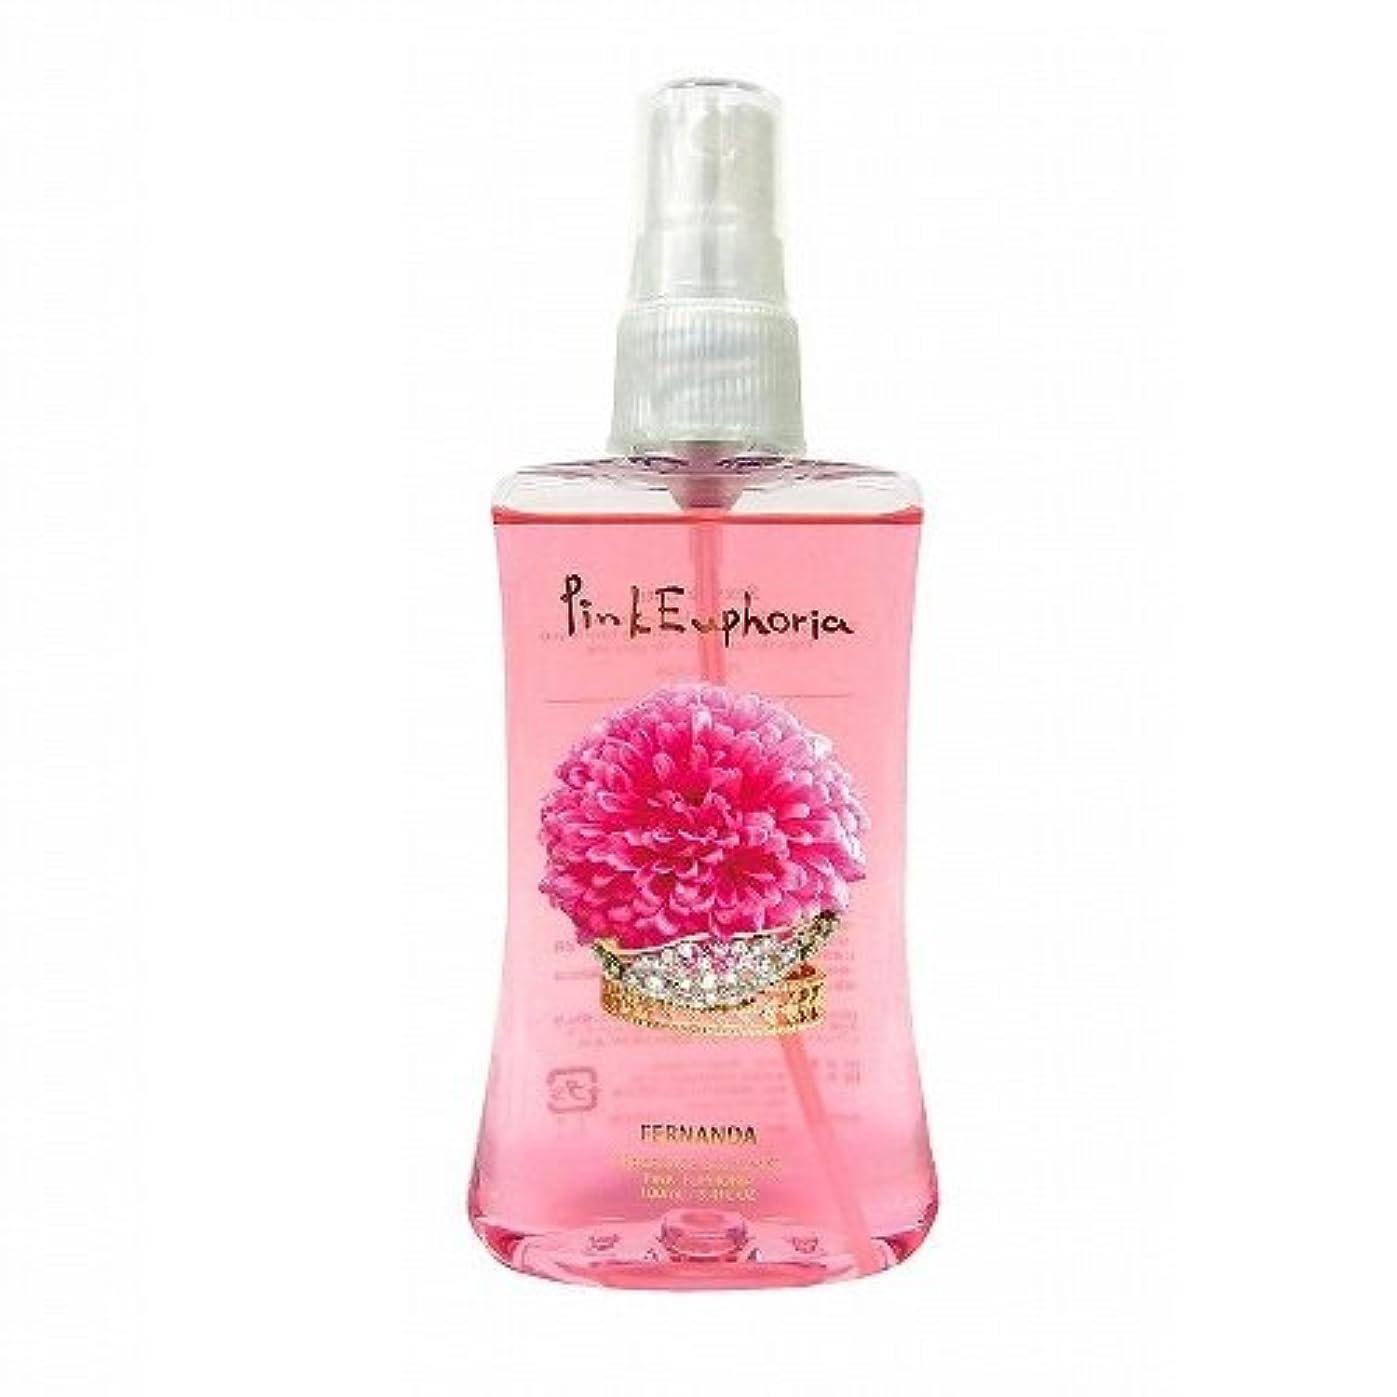 FERNANDA(フェルナンダ) Body Mist Pink Euphoria (ボディミスト ピンクエウフォリア)